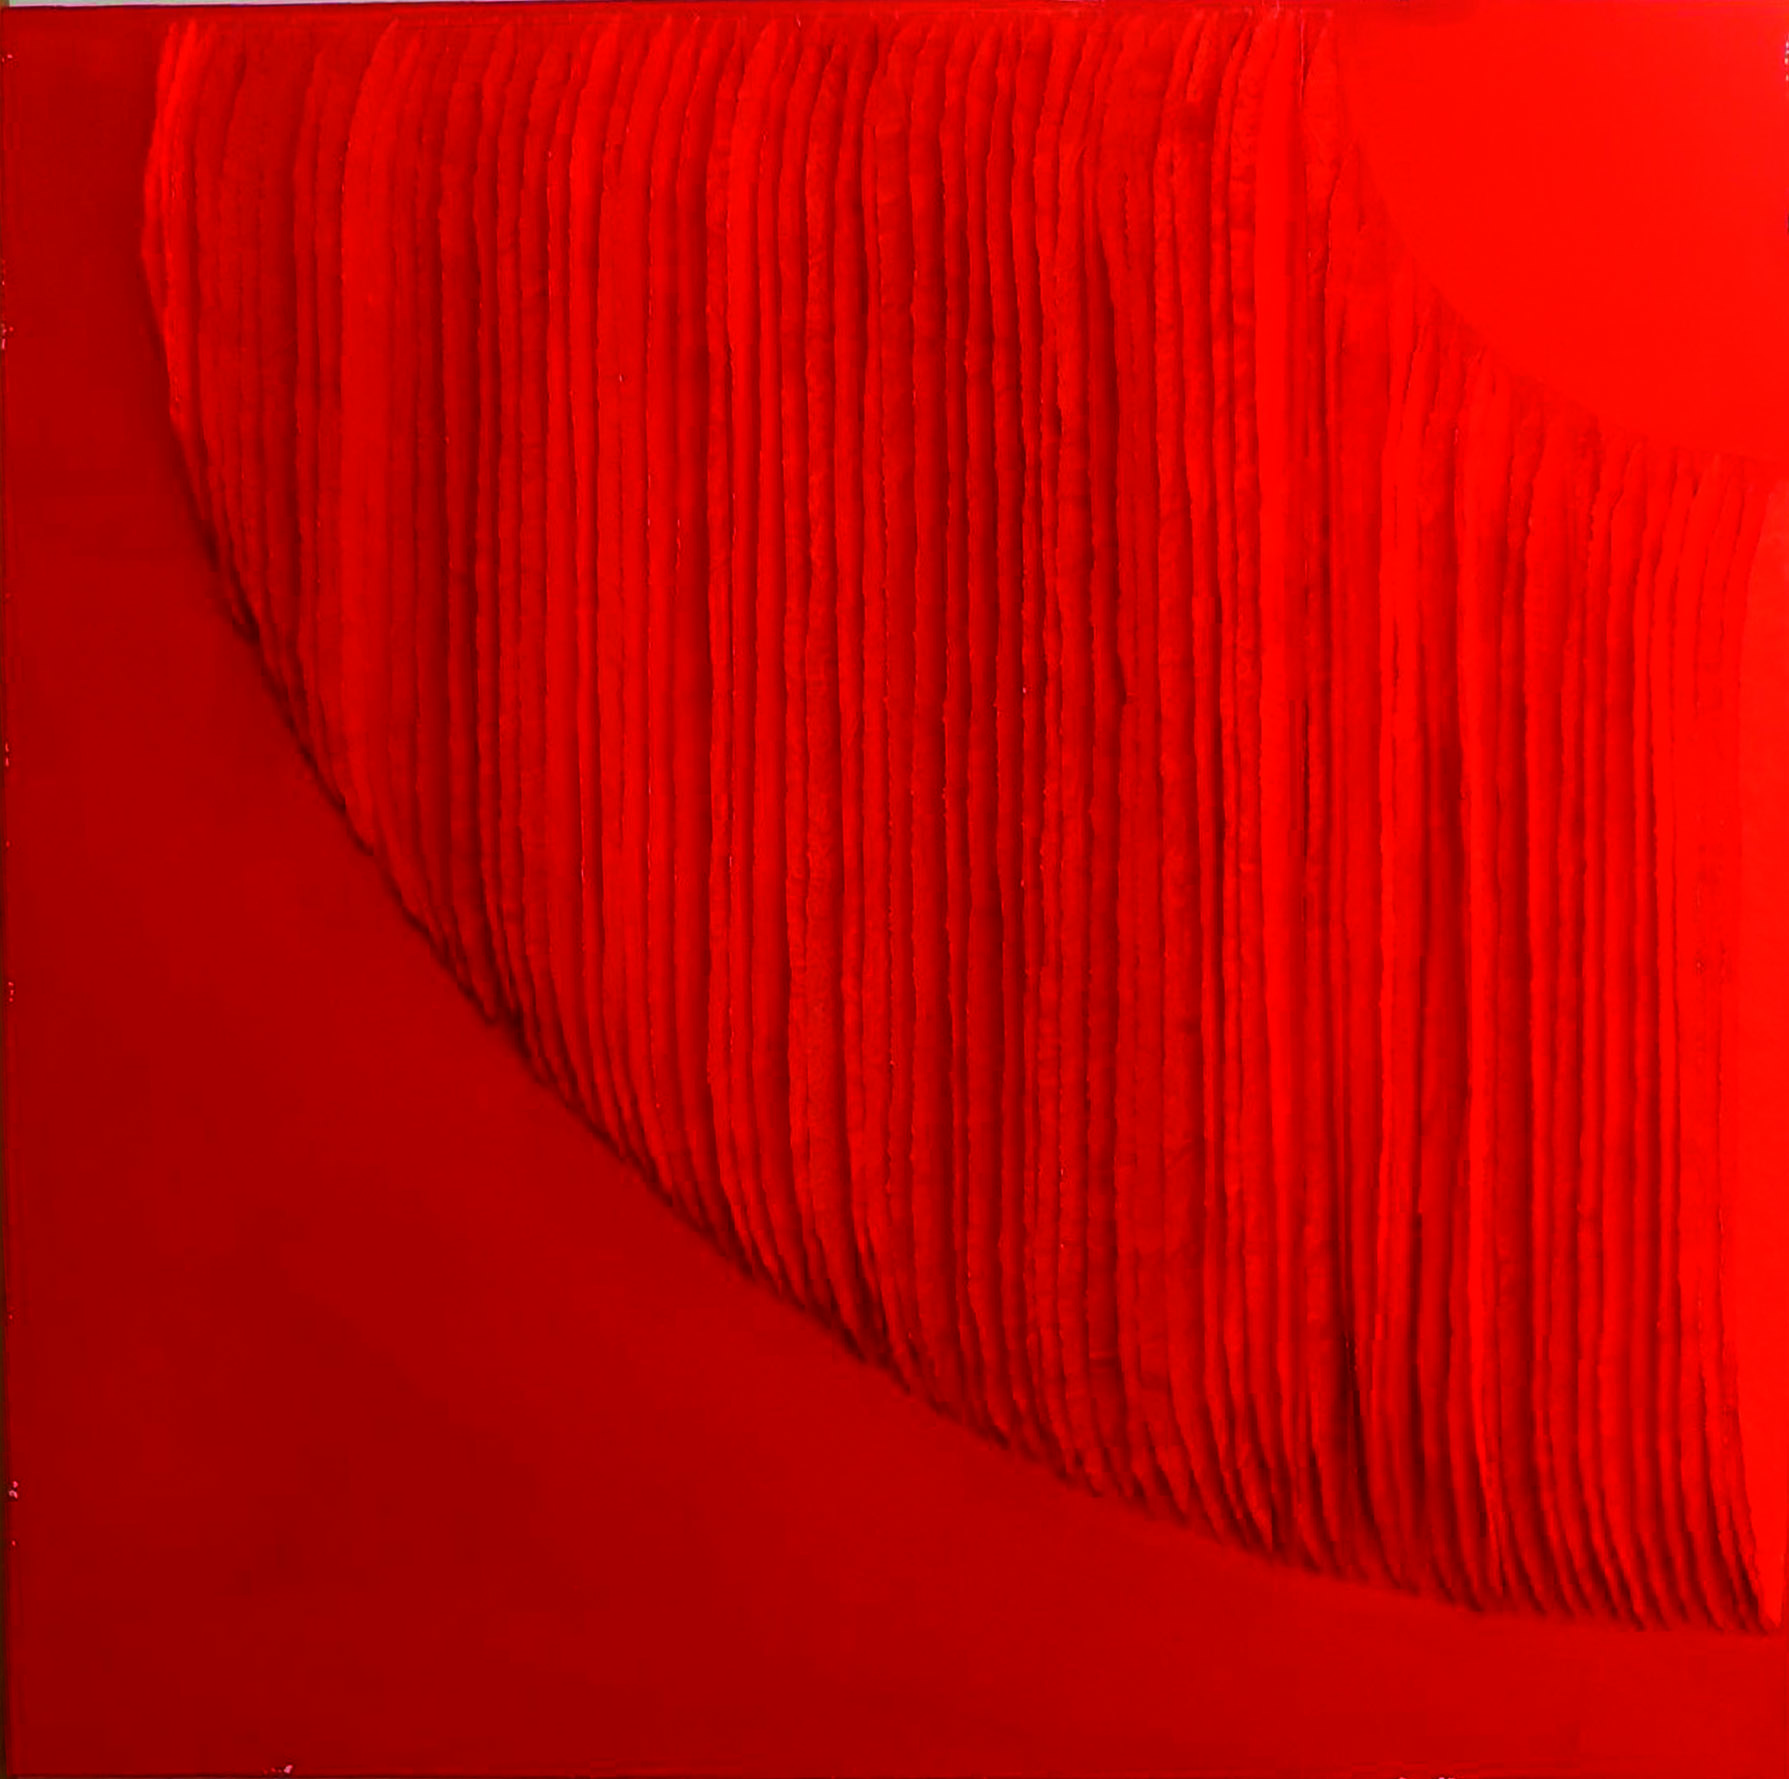 Frieda Martha Papierarbeit, Farbe sehen rot, 2015